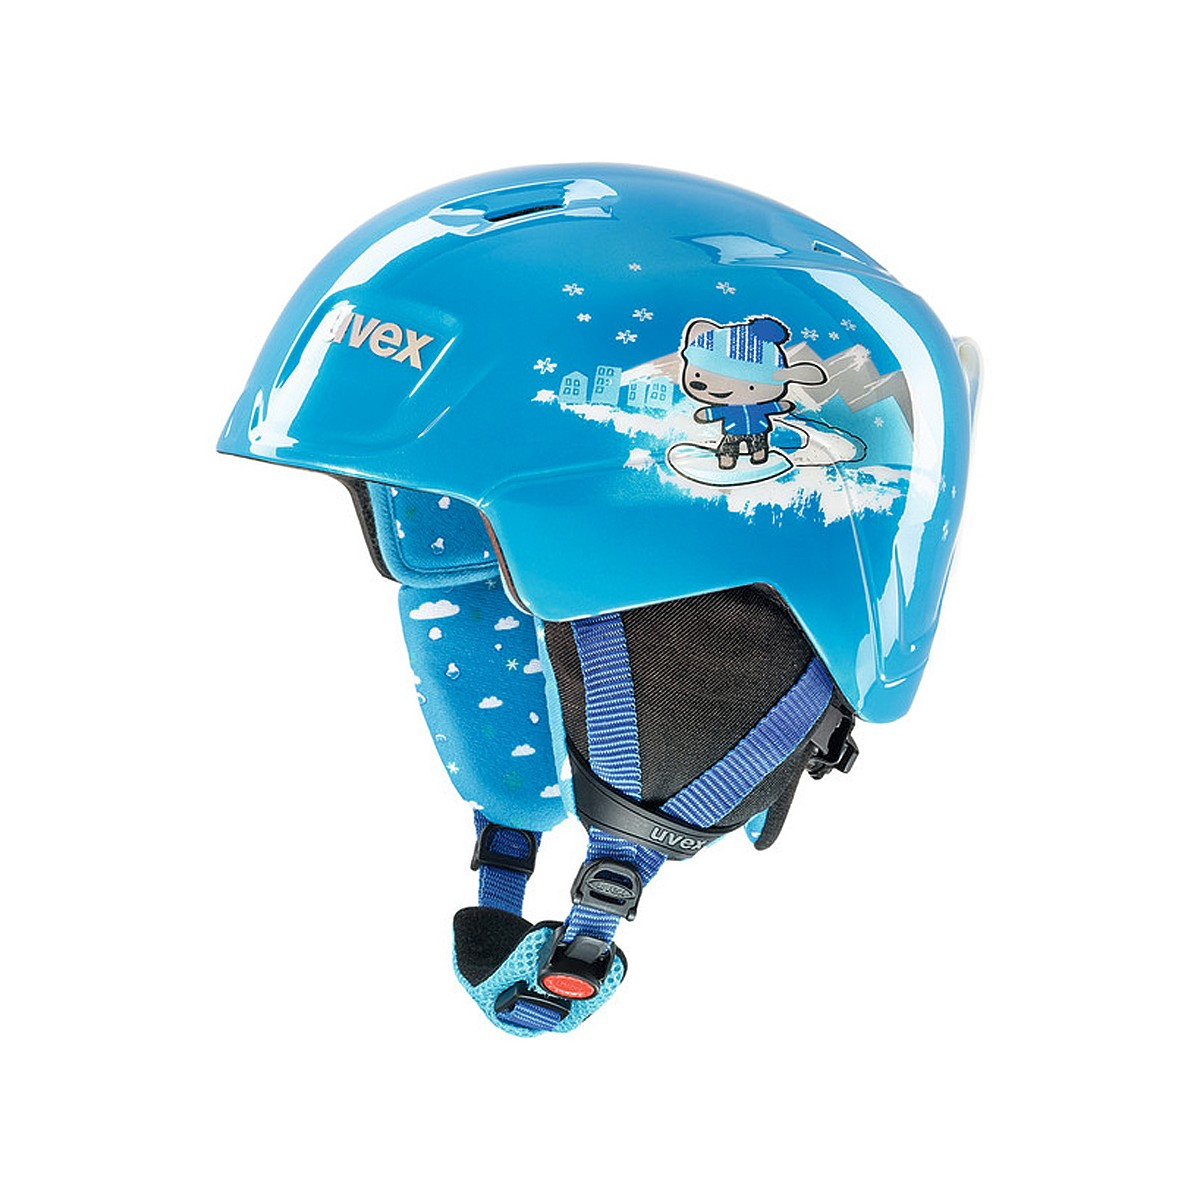 Casco sci Uvex Manic (Colore: blu, Taglia: 51/55)